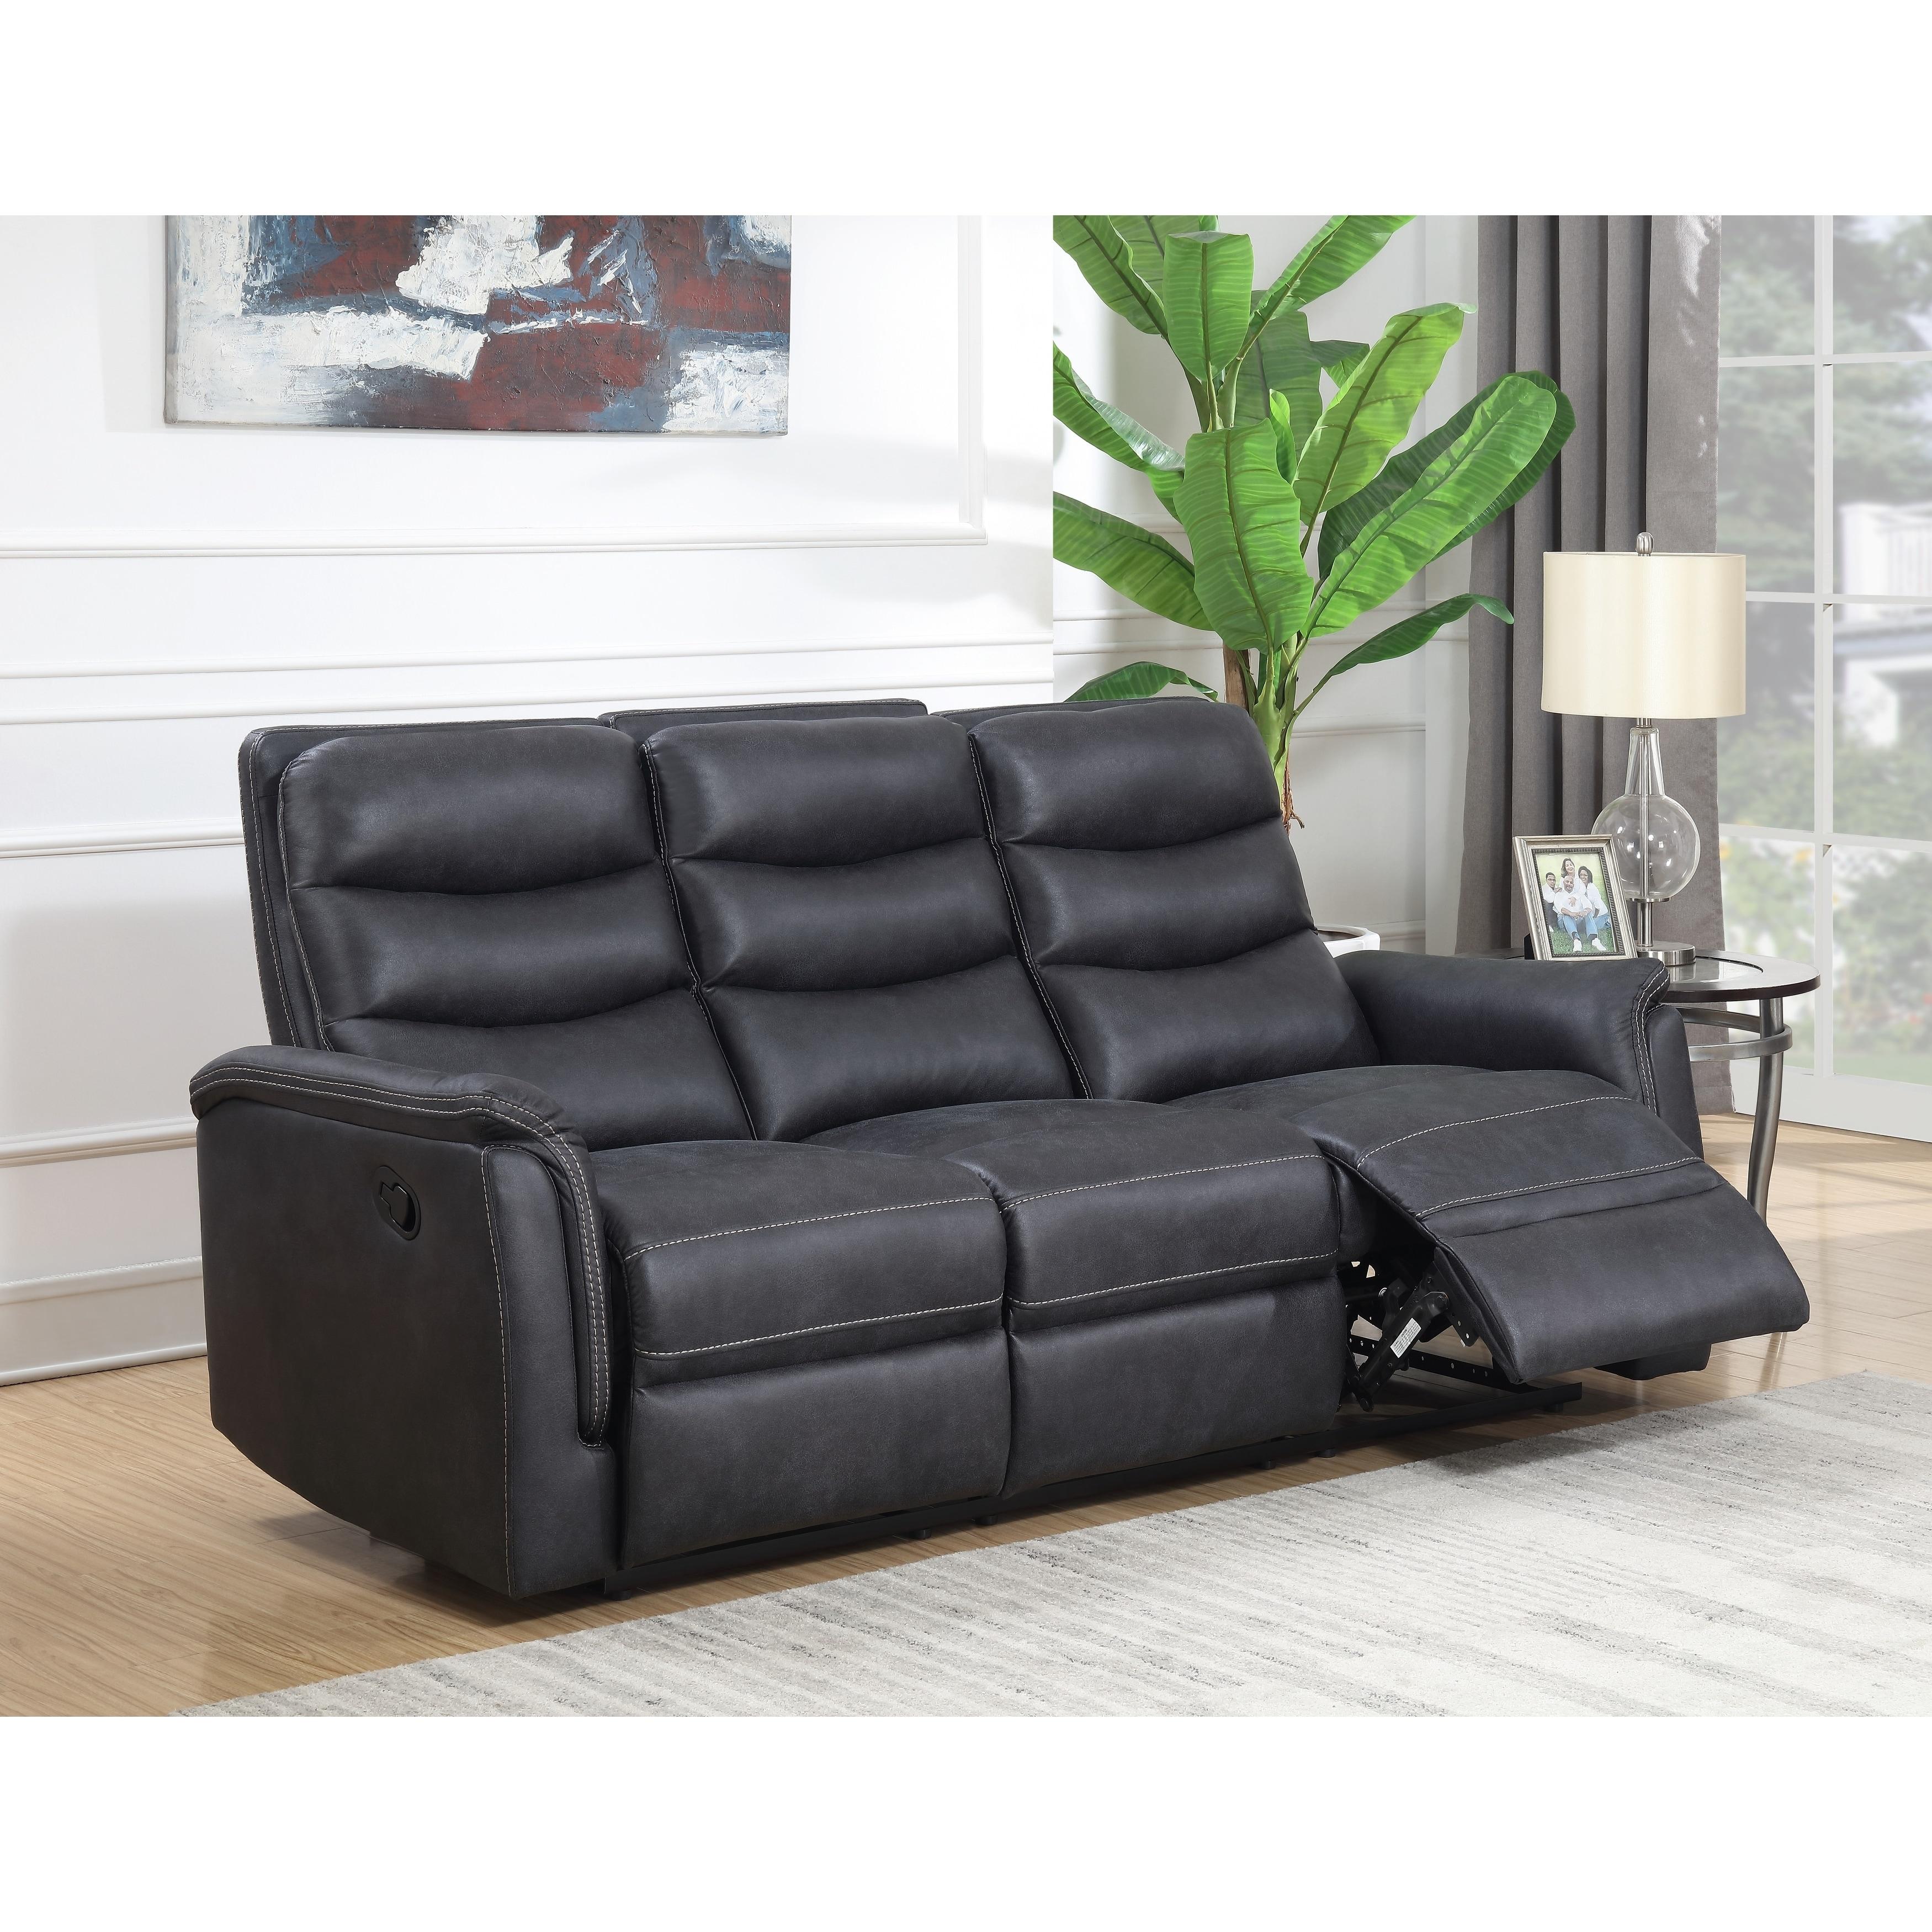 Segar Dual Reclining Sofa N A Ebay